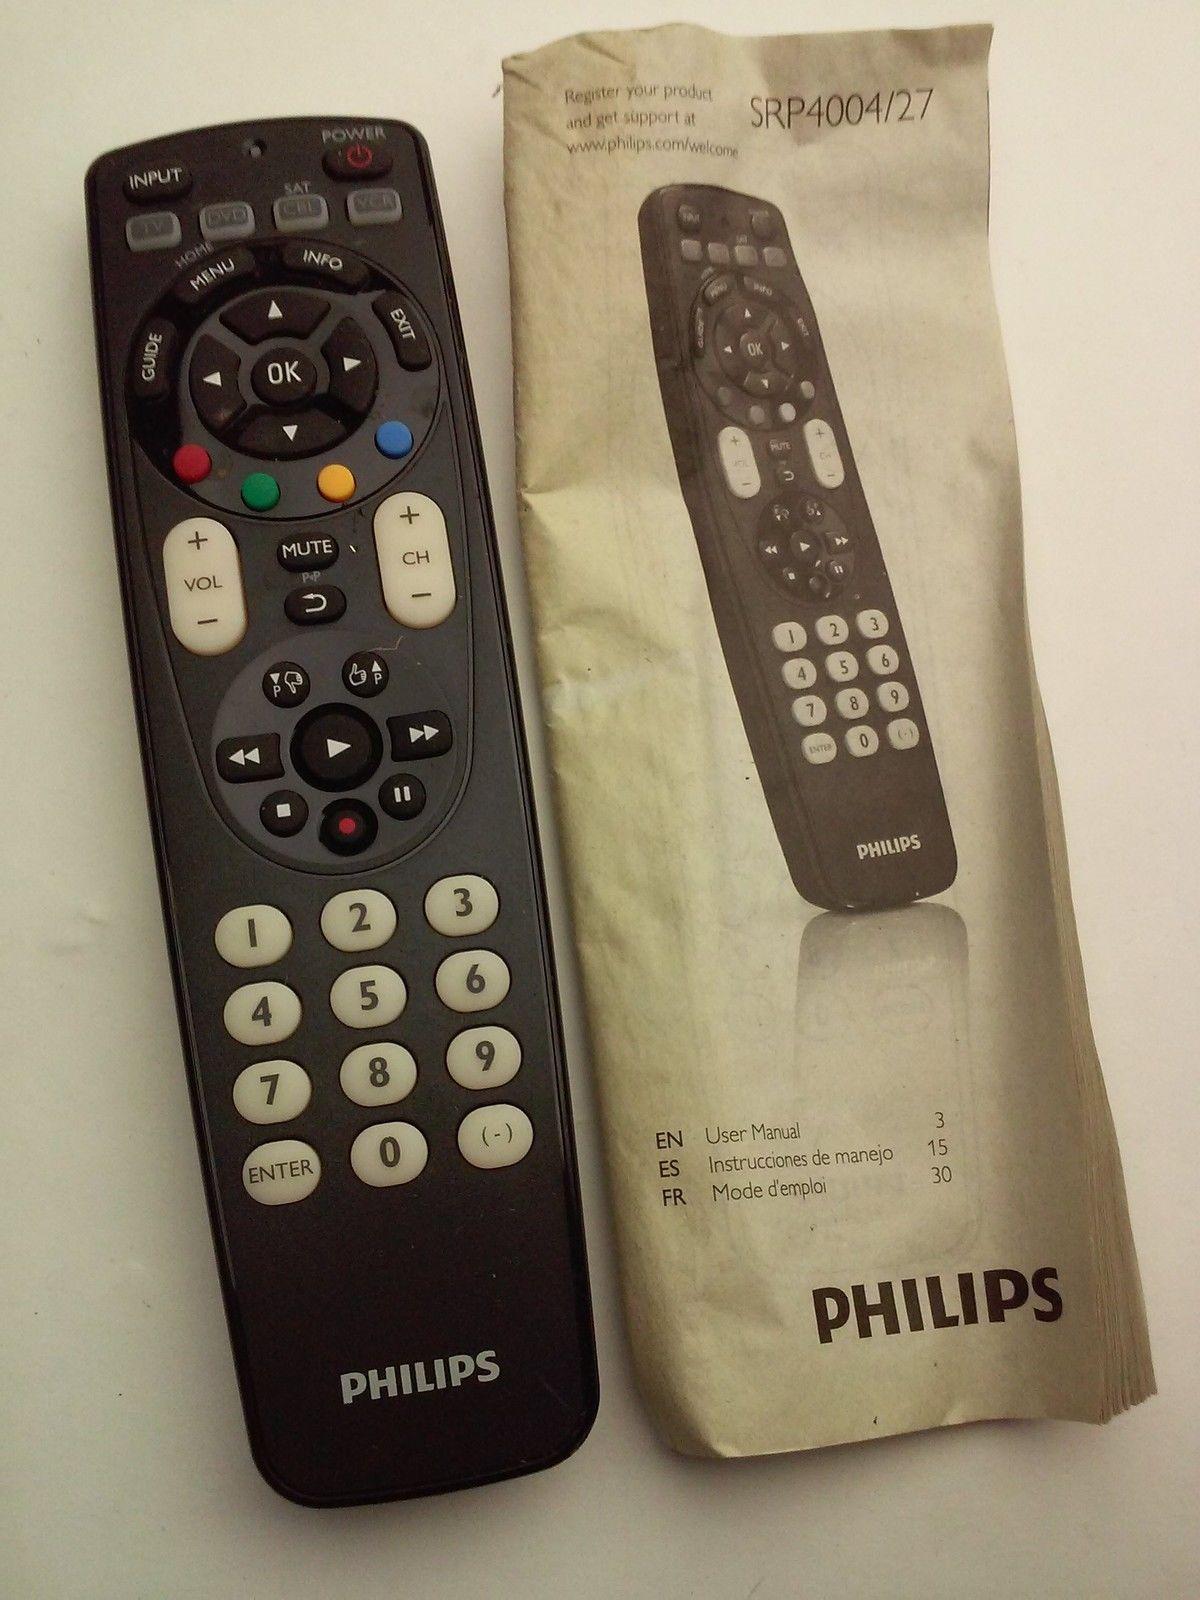 philips srp4004 27 remote control and 50 similar items rh bonanza com  philips remote srp4004/27 manual